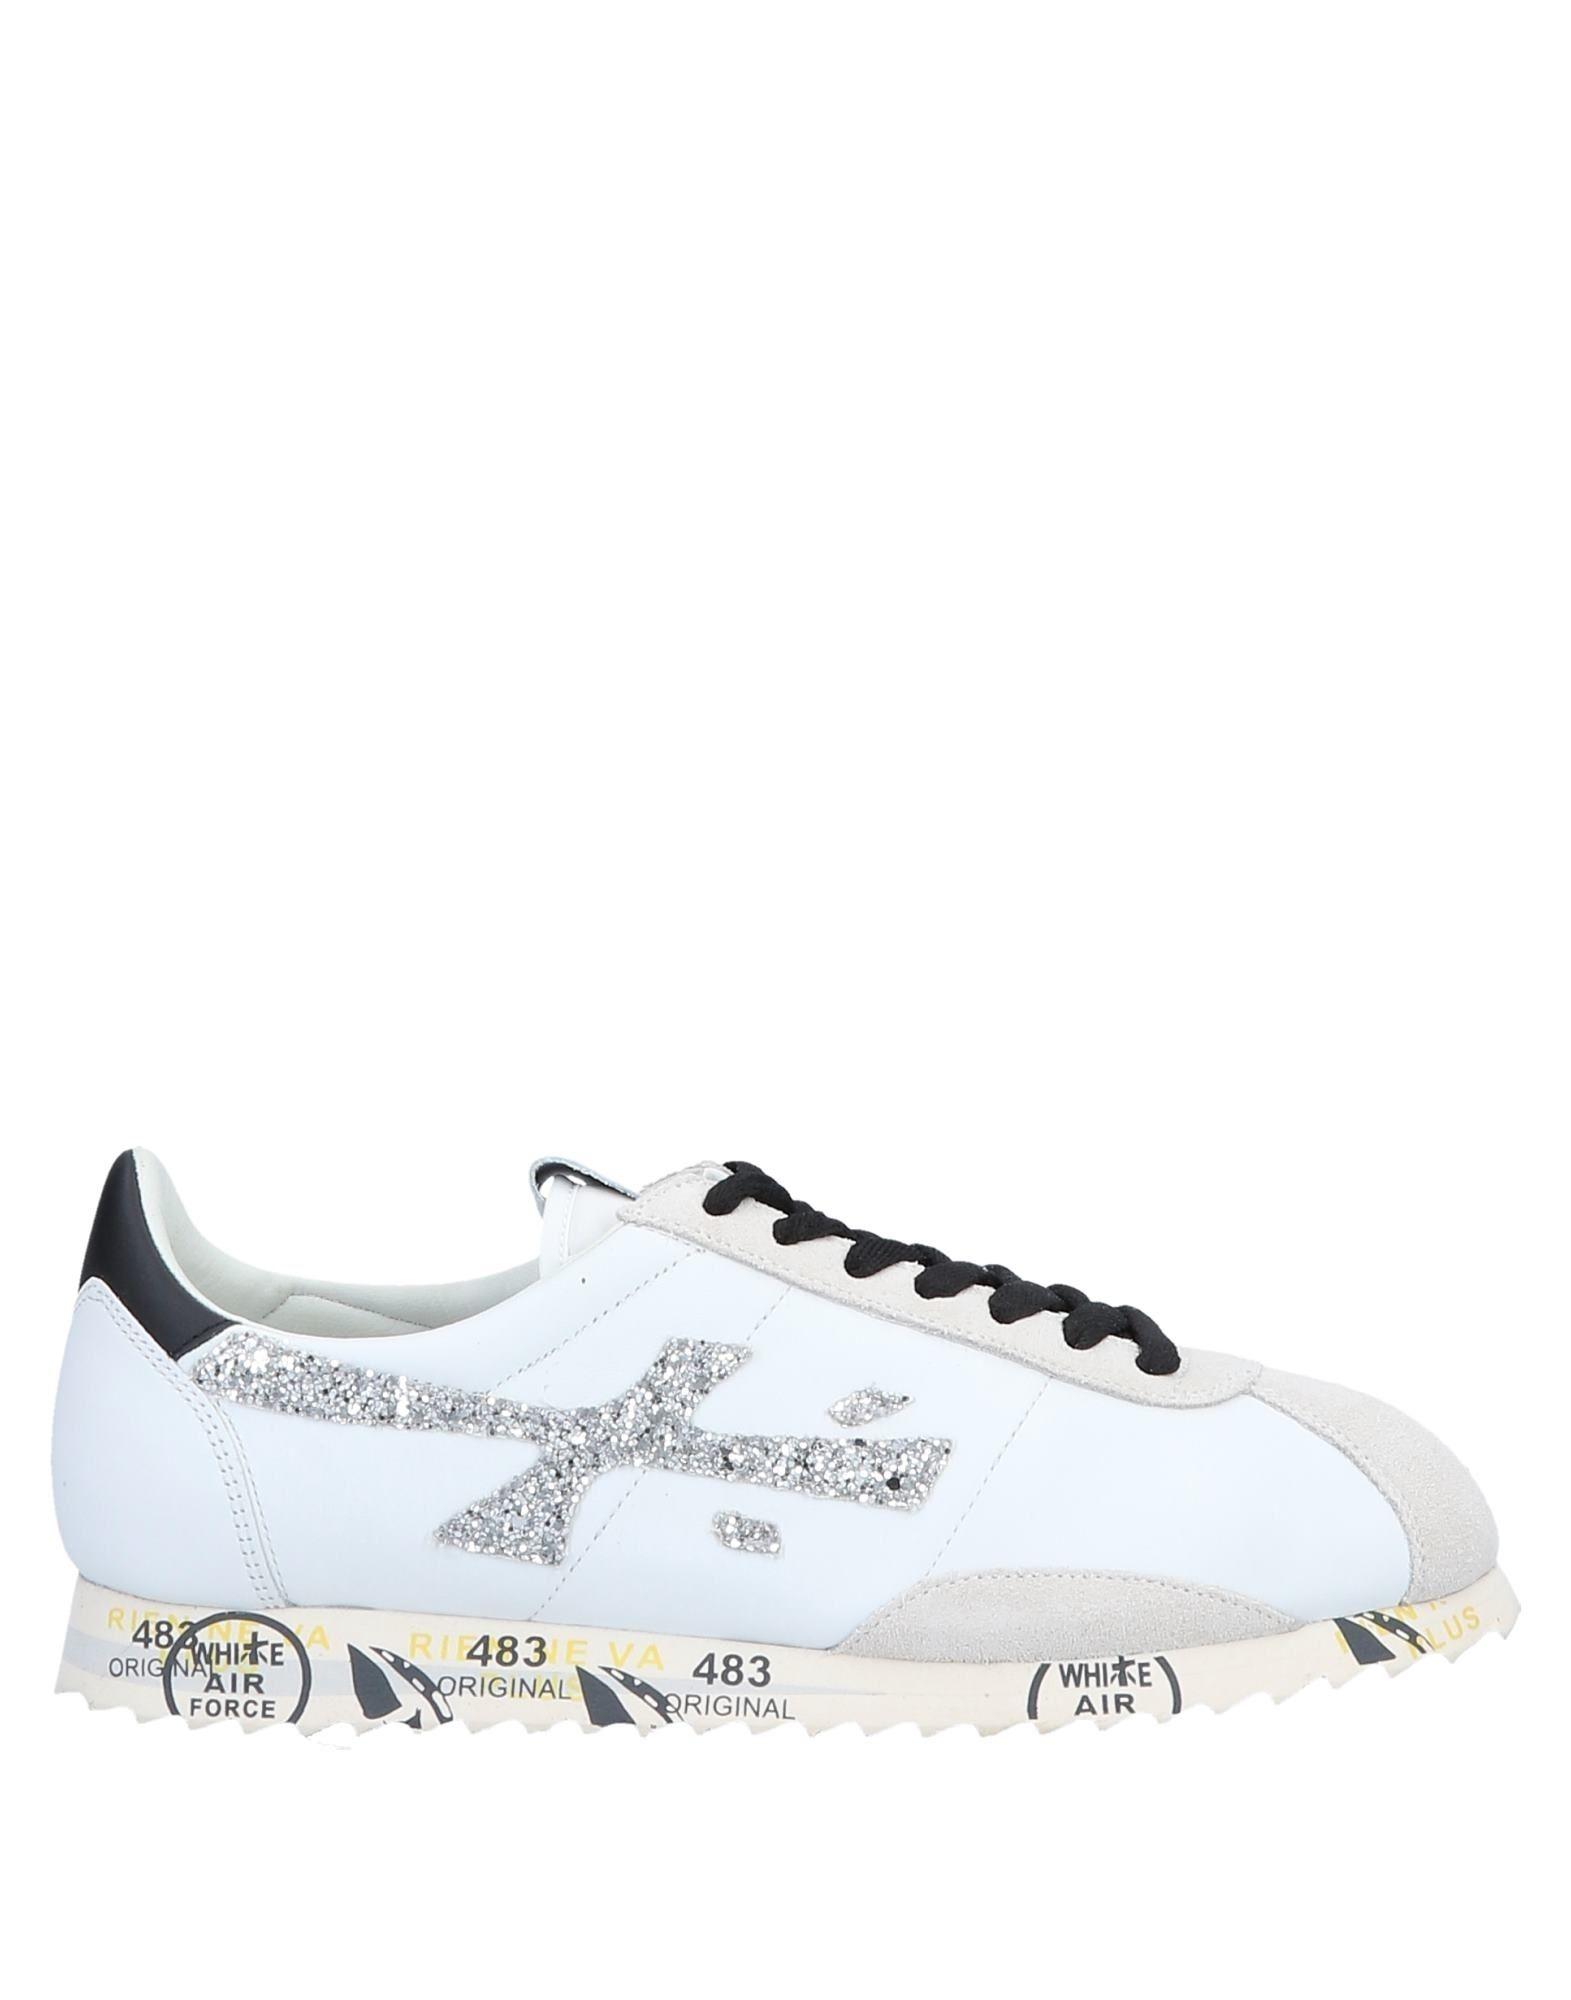 Premiata on Sneakers - Women Premiata Sneakers online on Premiata  Australia - 11570482SL f2f09a